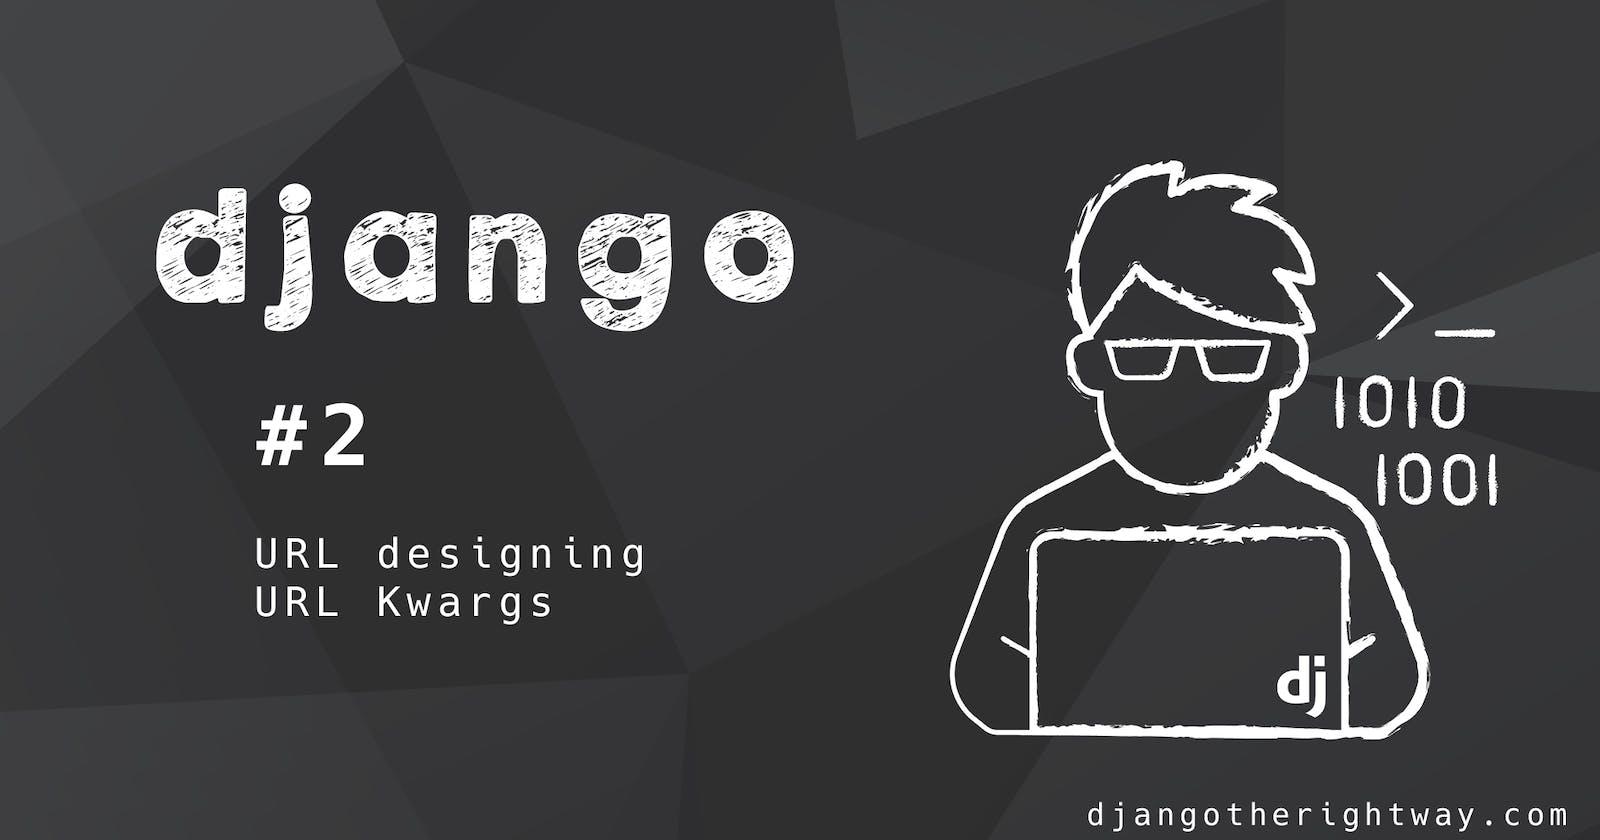 URL designing and  URL kwargs in Django